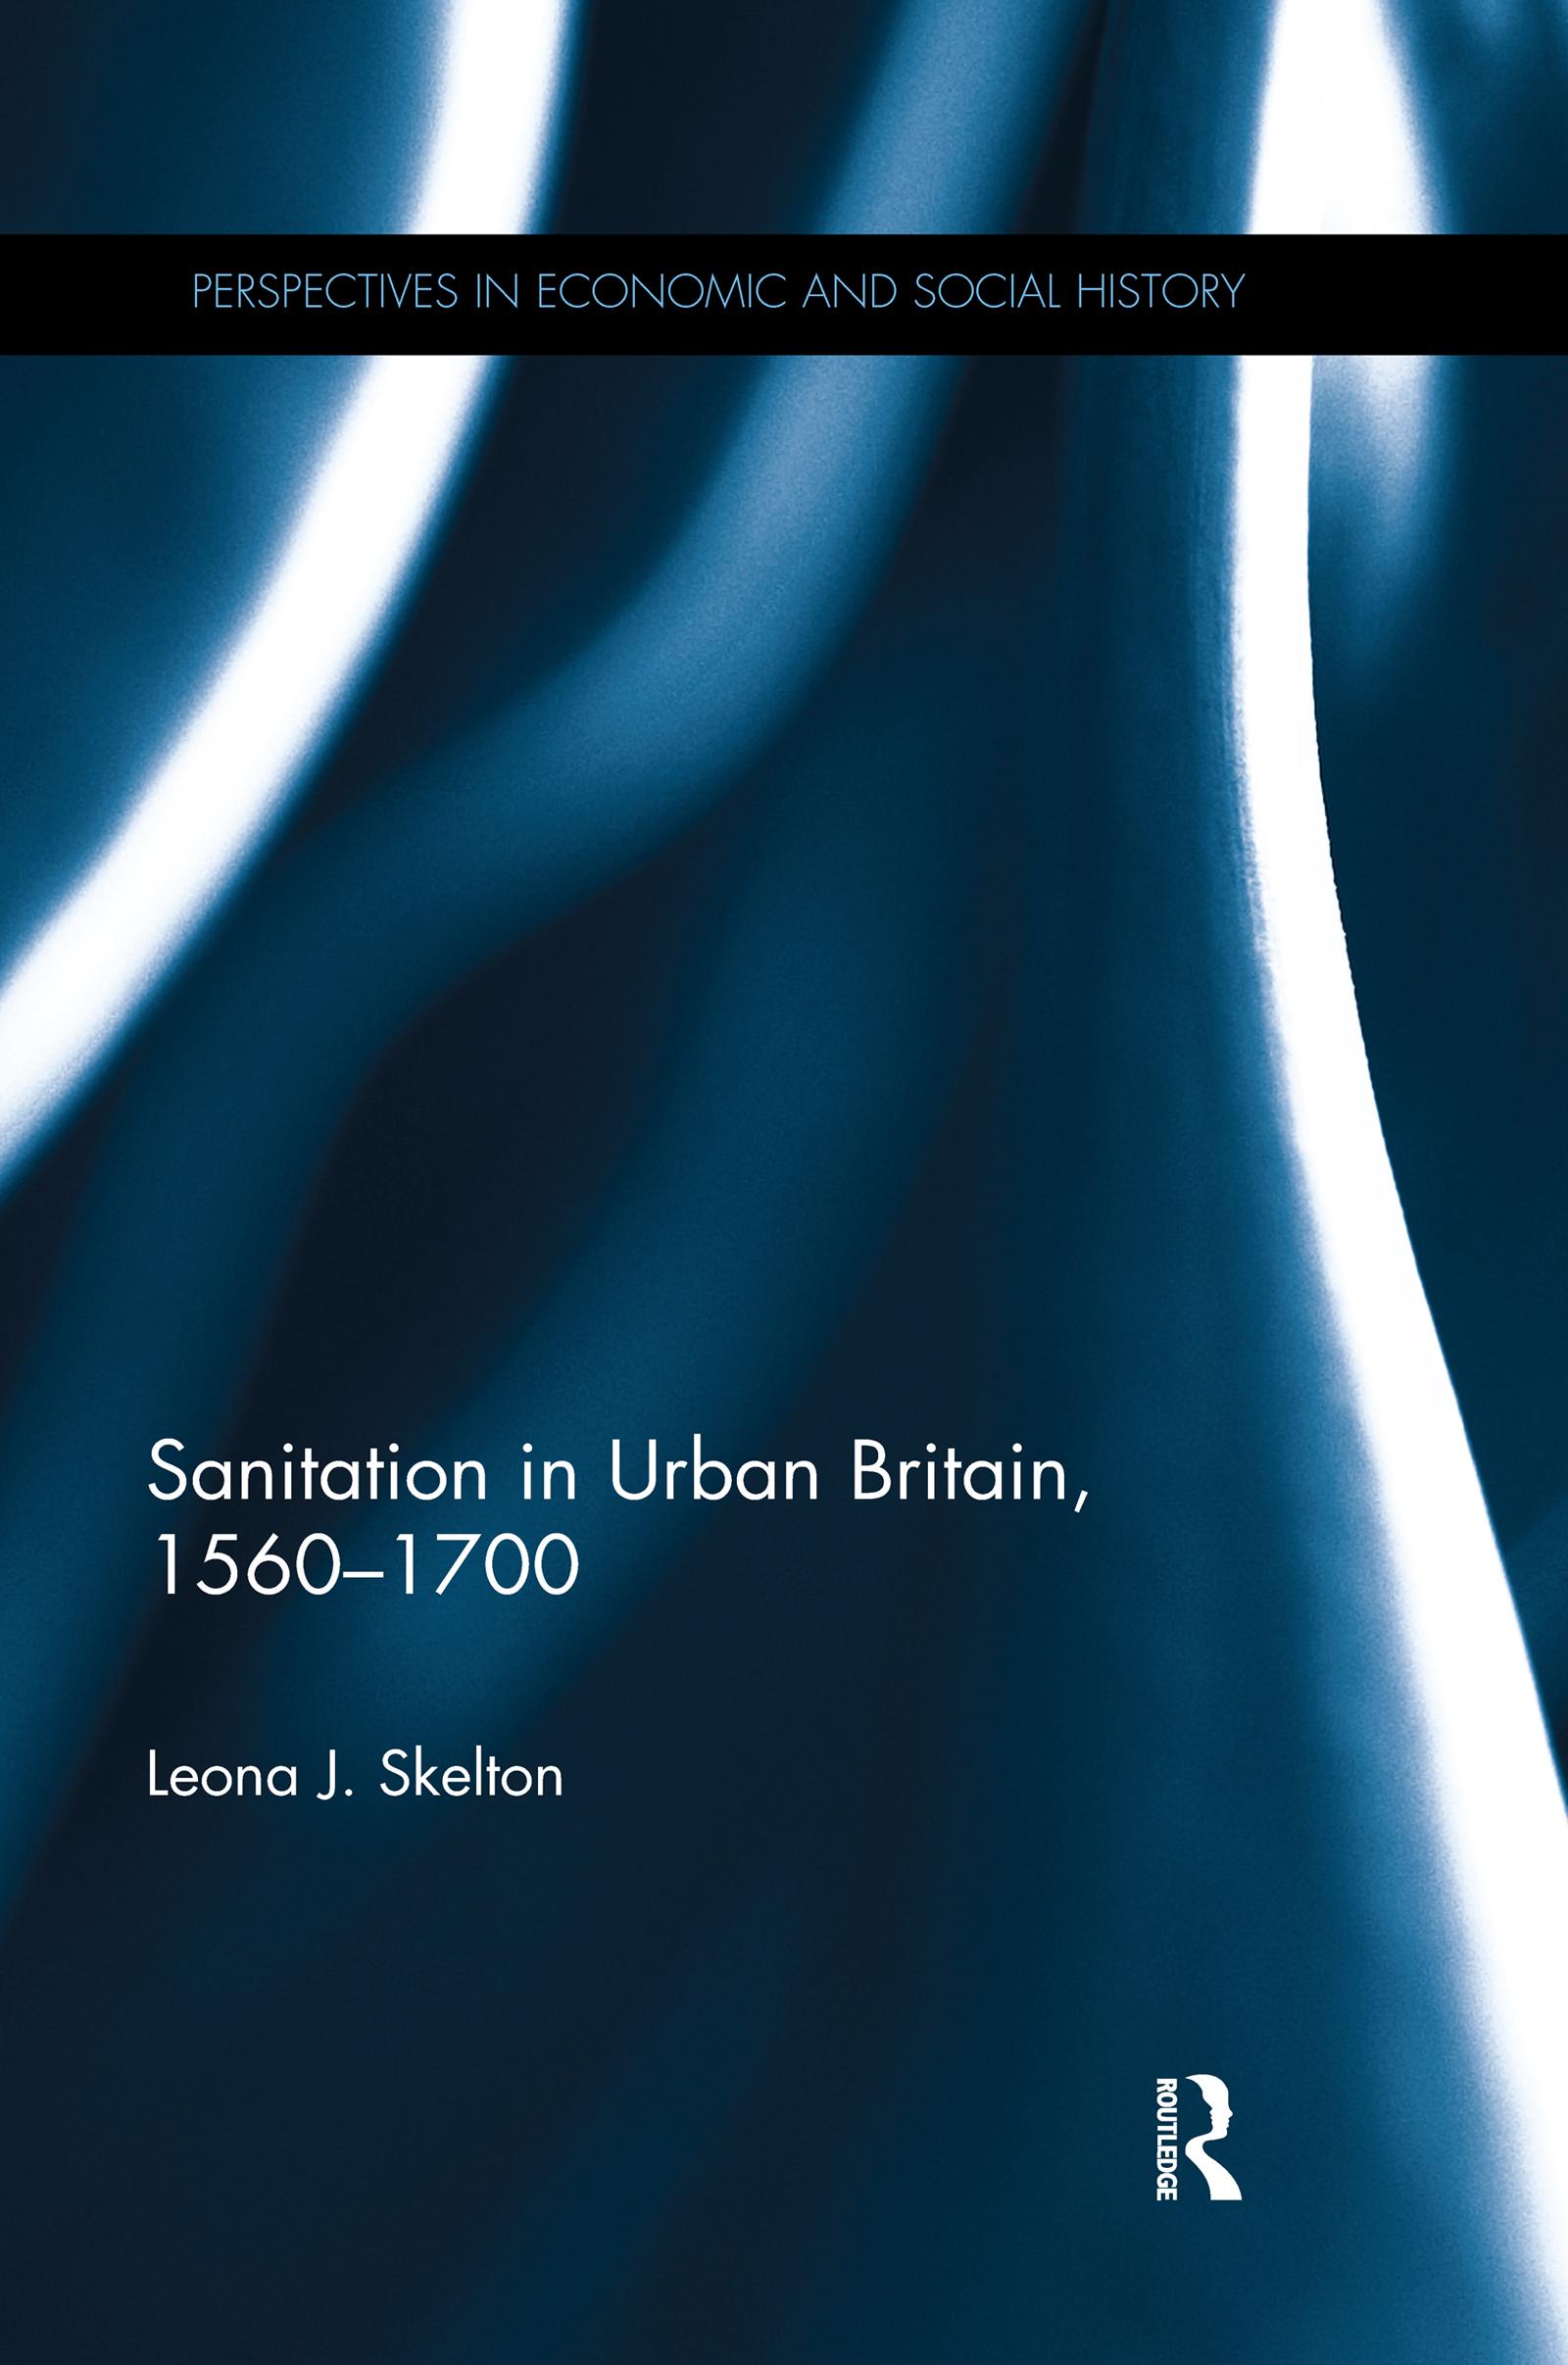 Sanitation in Urban Britain, 1560-1700